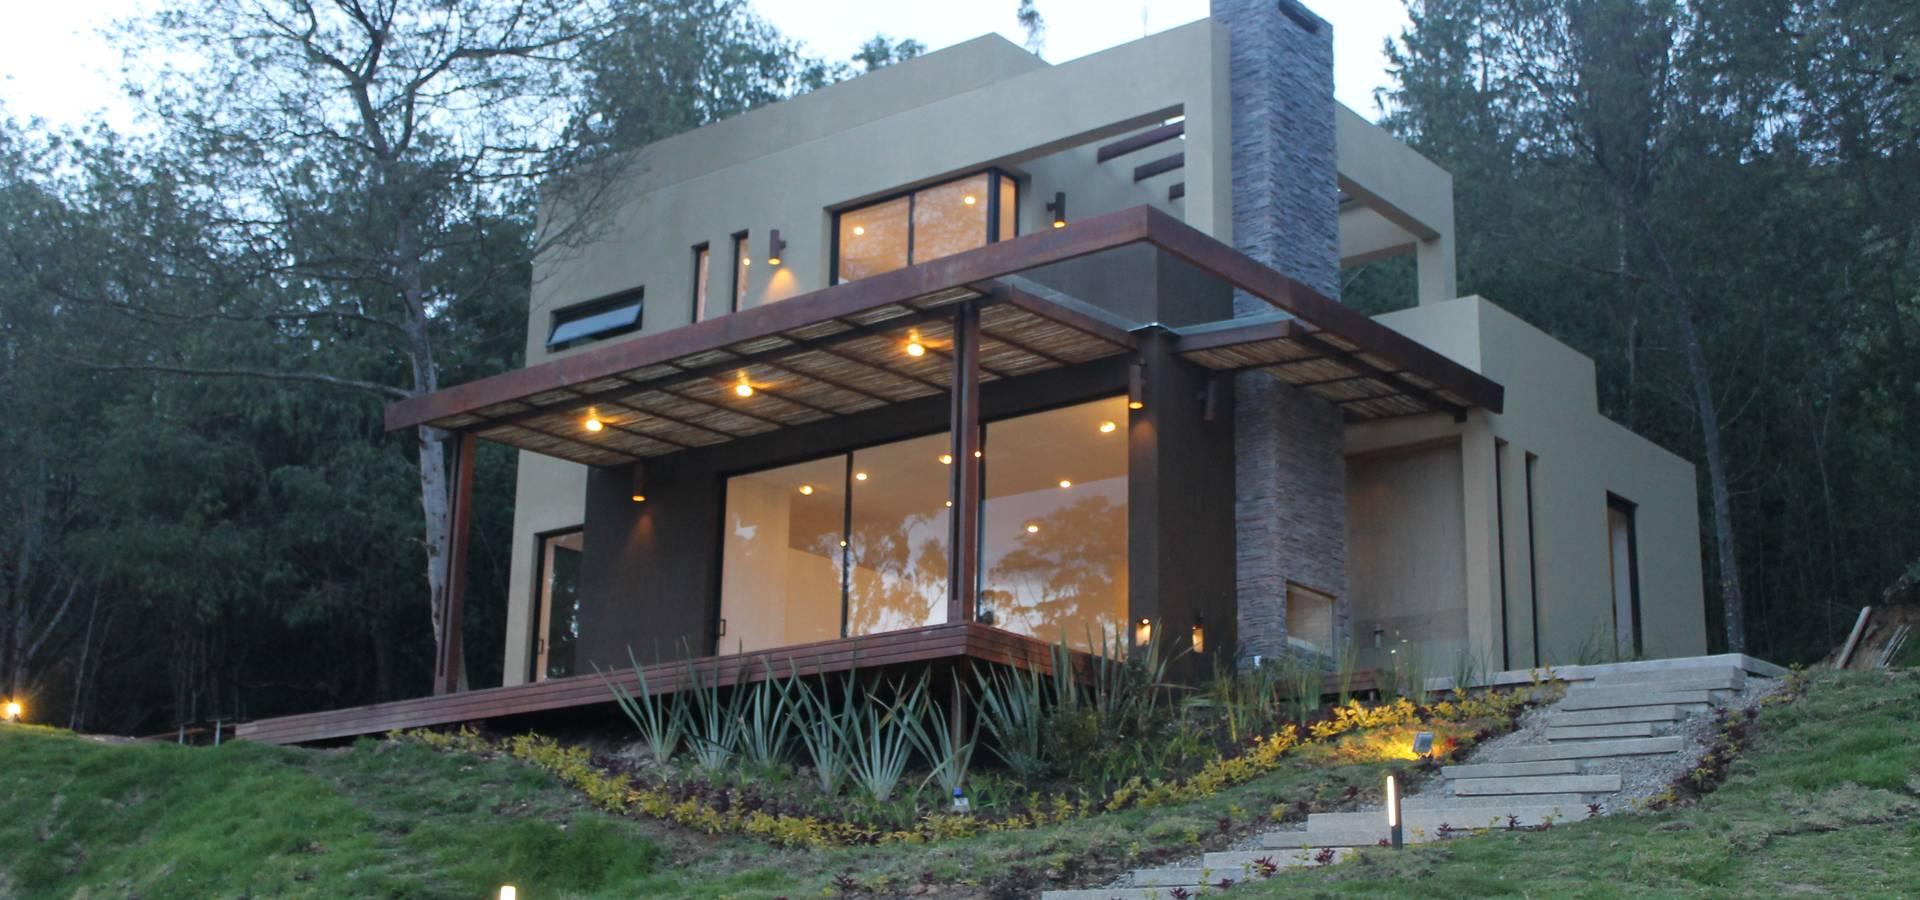 IngeniARQ Arquitectura + Ingeniería